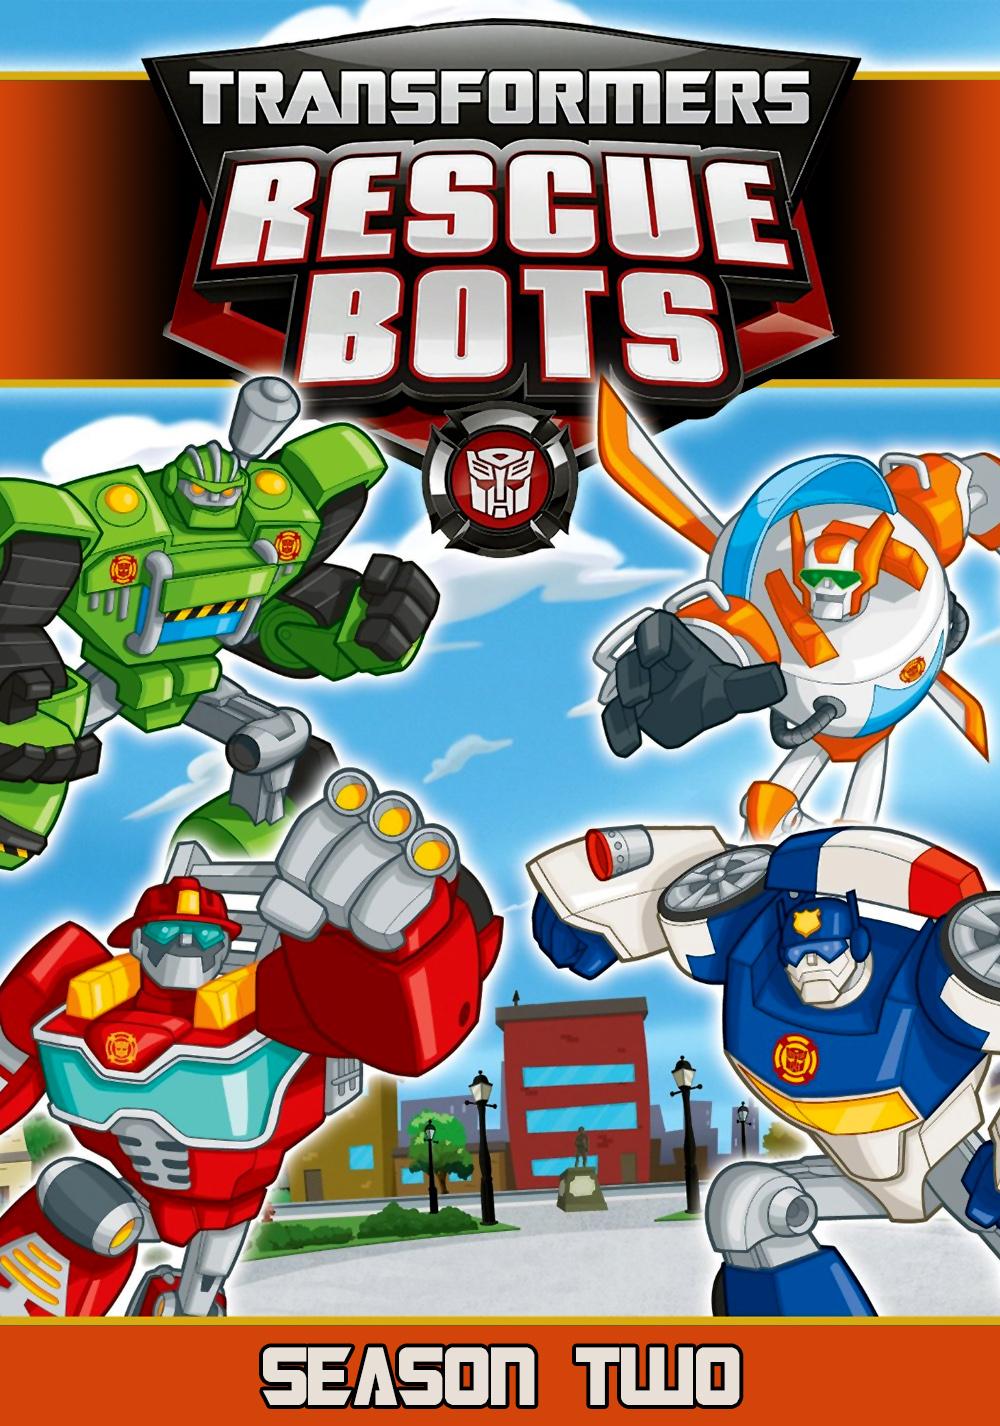 Transformers: Rescue Bots Tv Season Poster Image